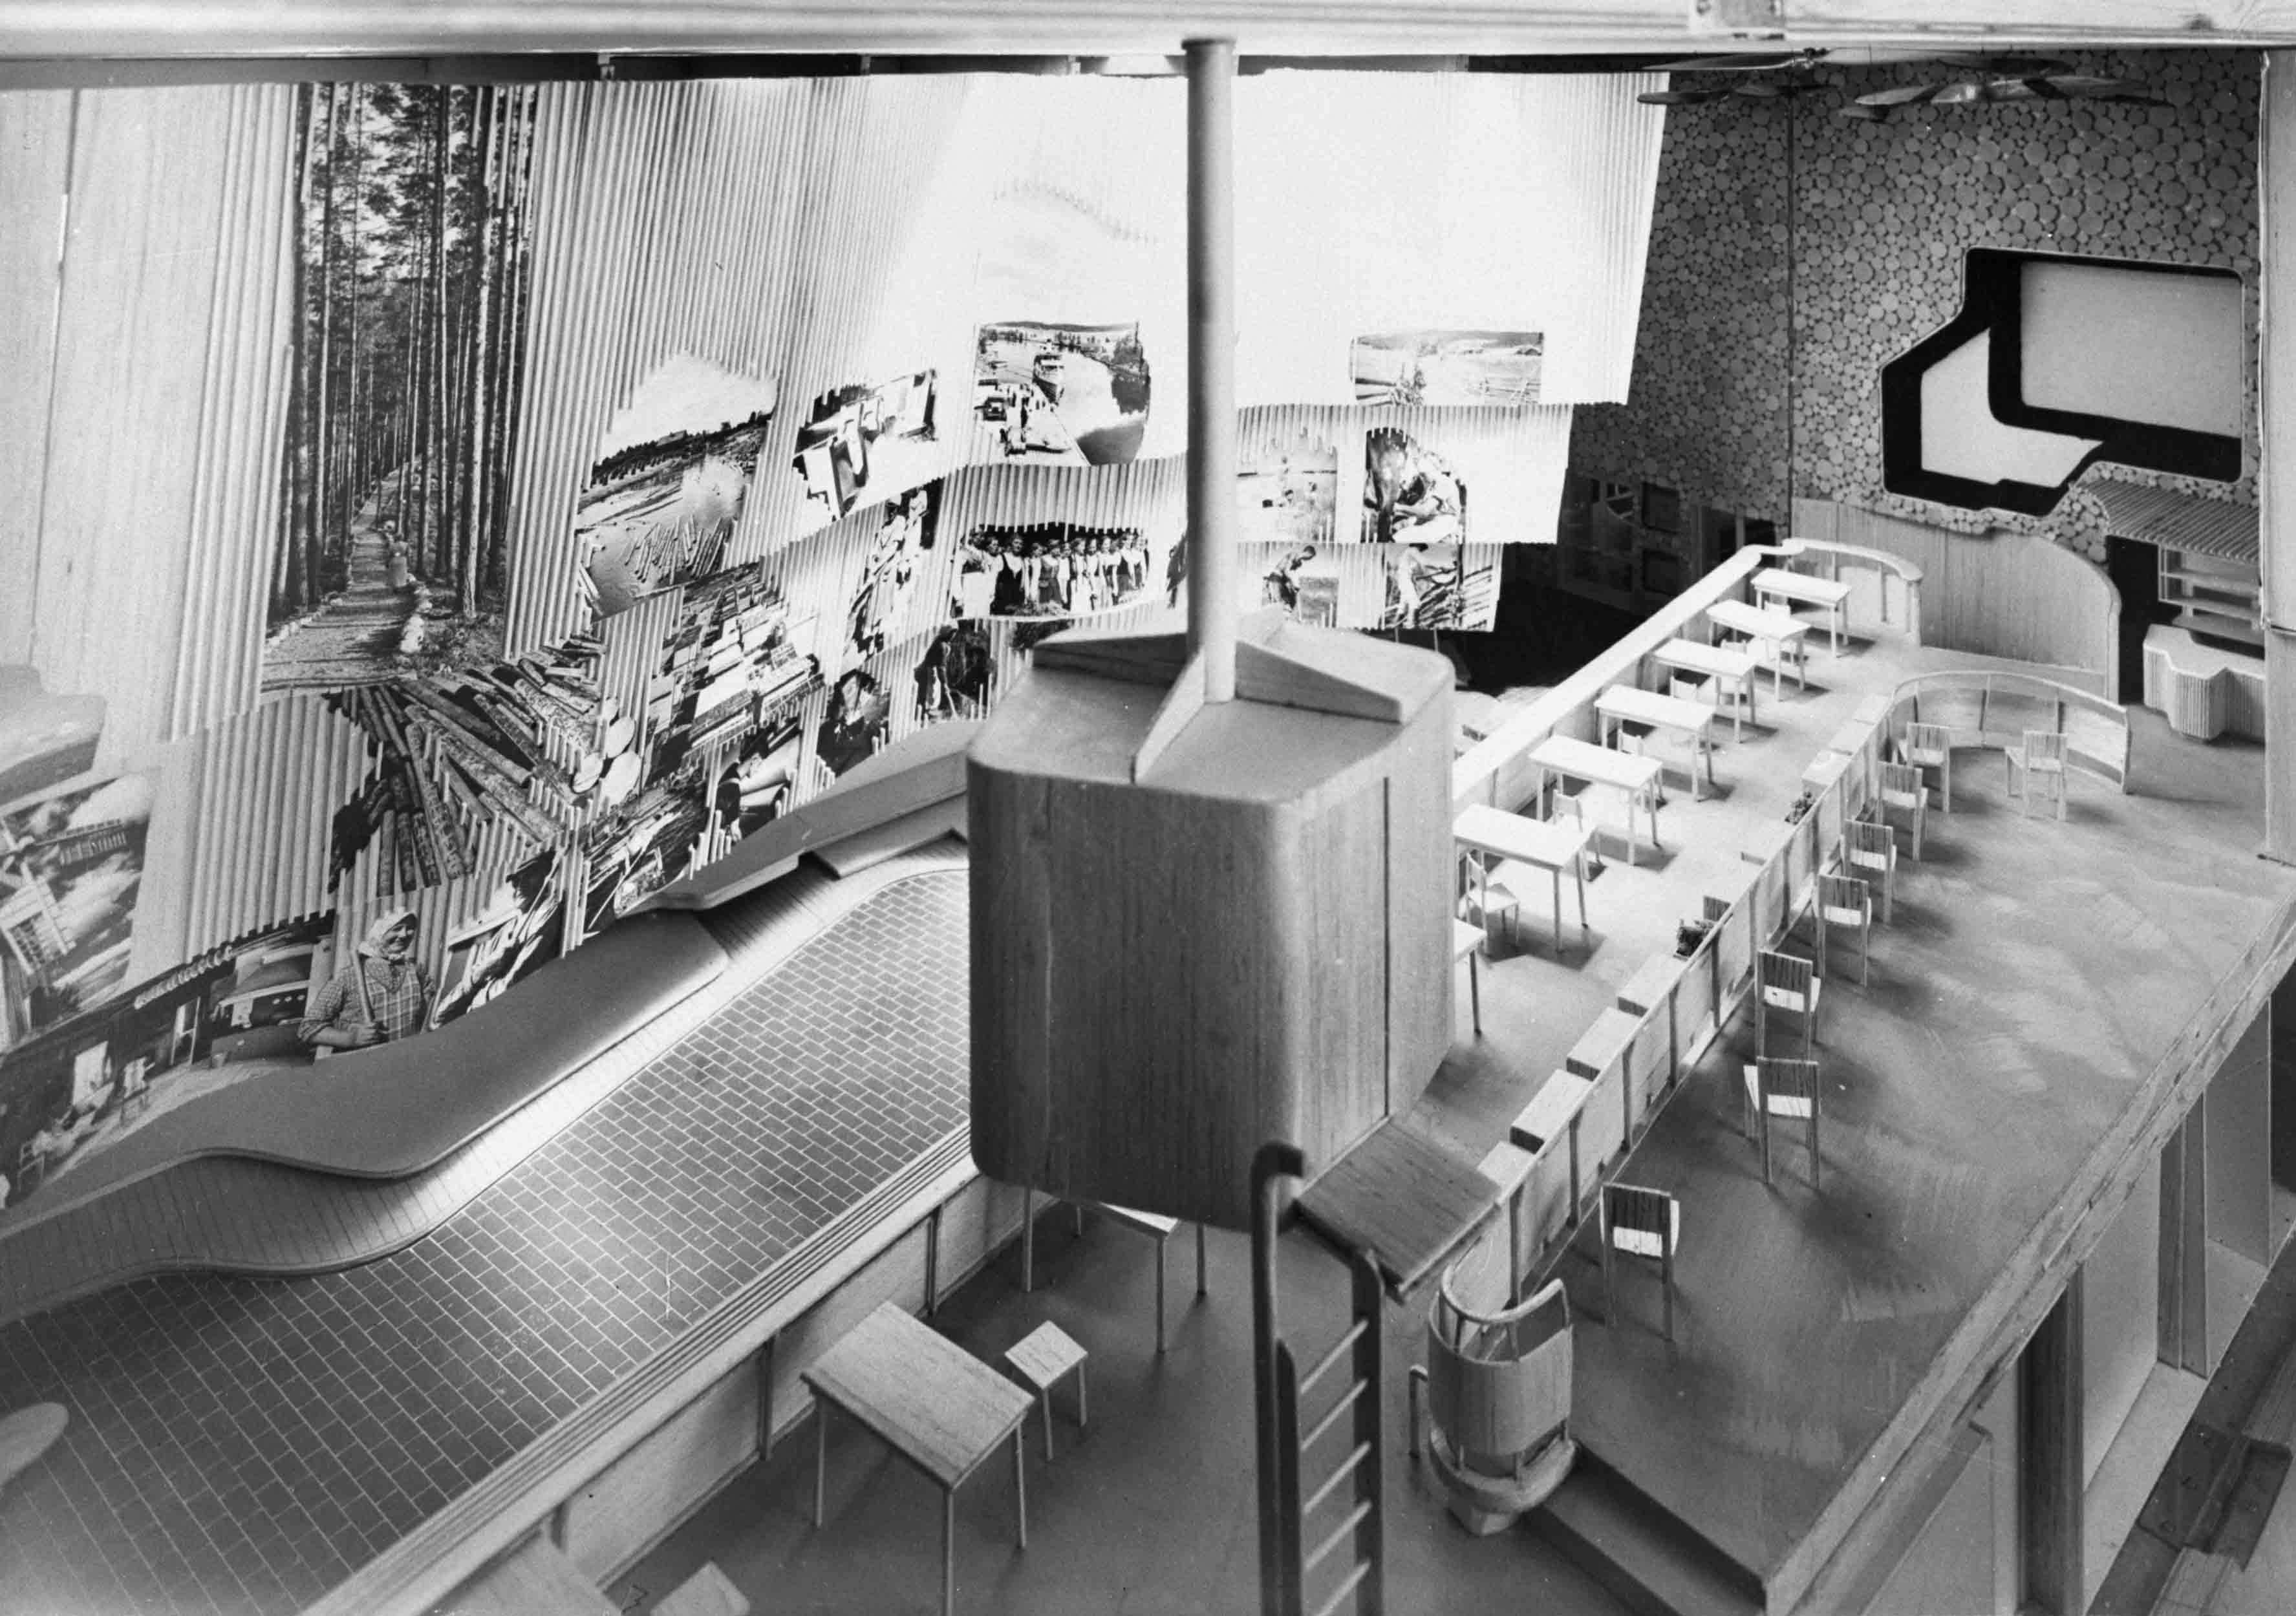 Pavillon finlandais, Expo universelle 1939 ©Alvar Aalto Museum